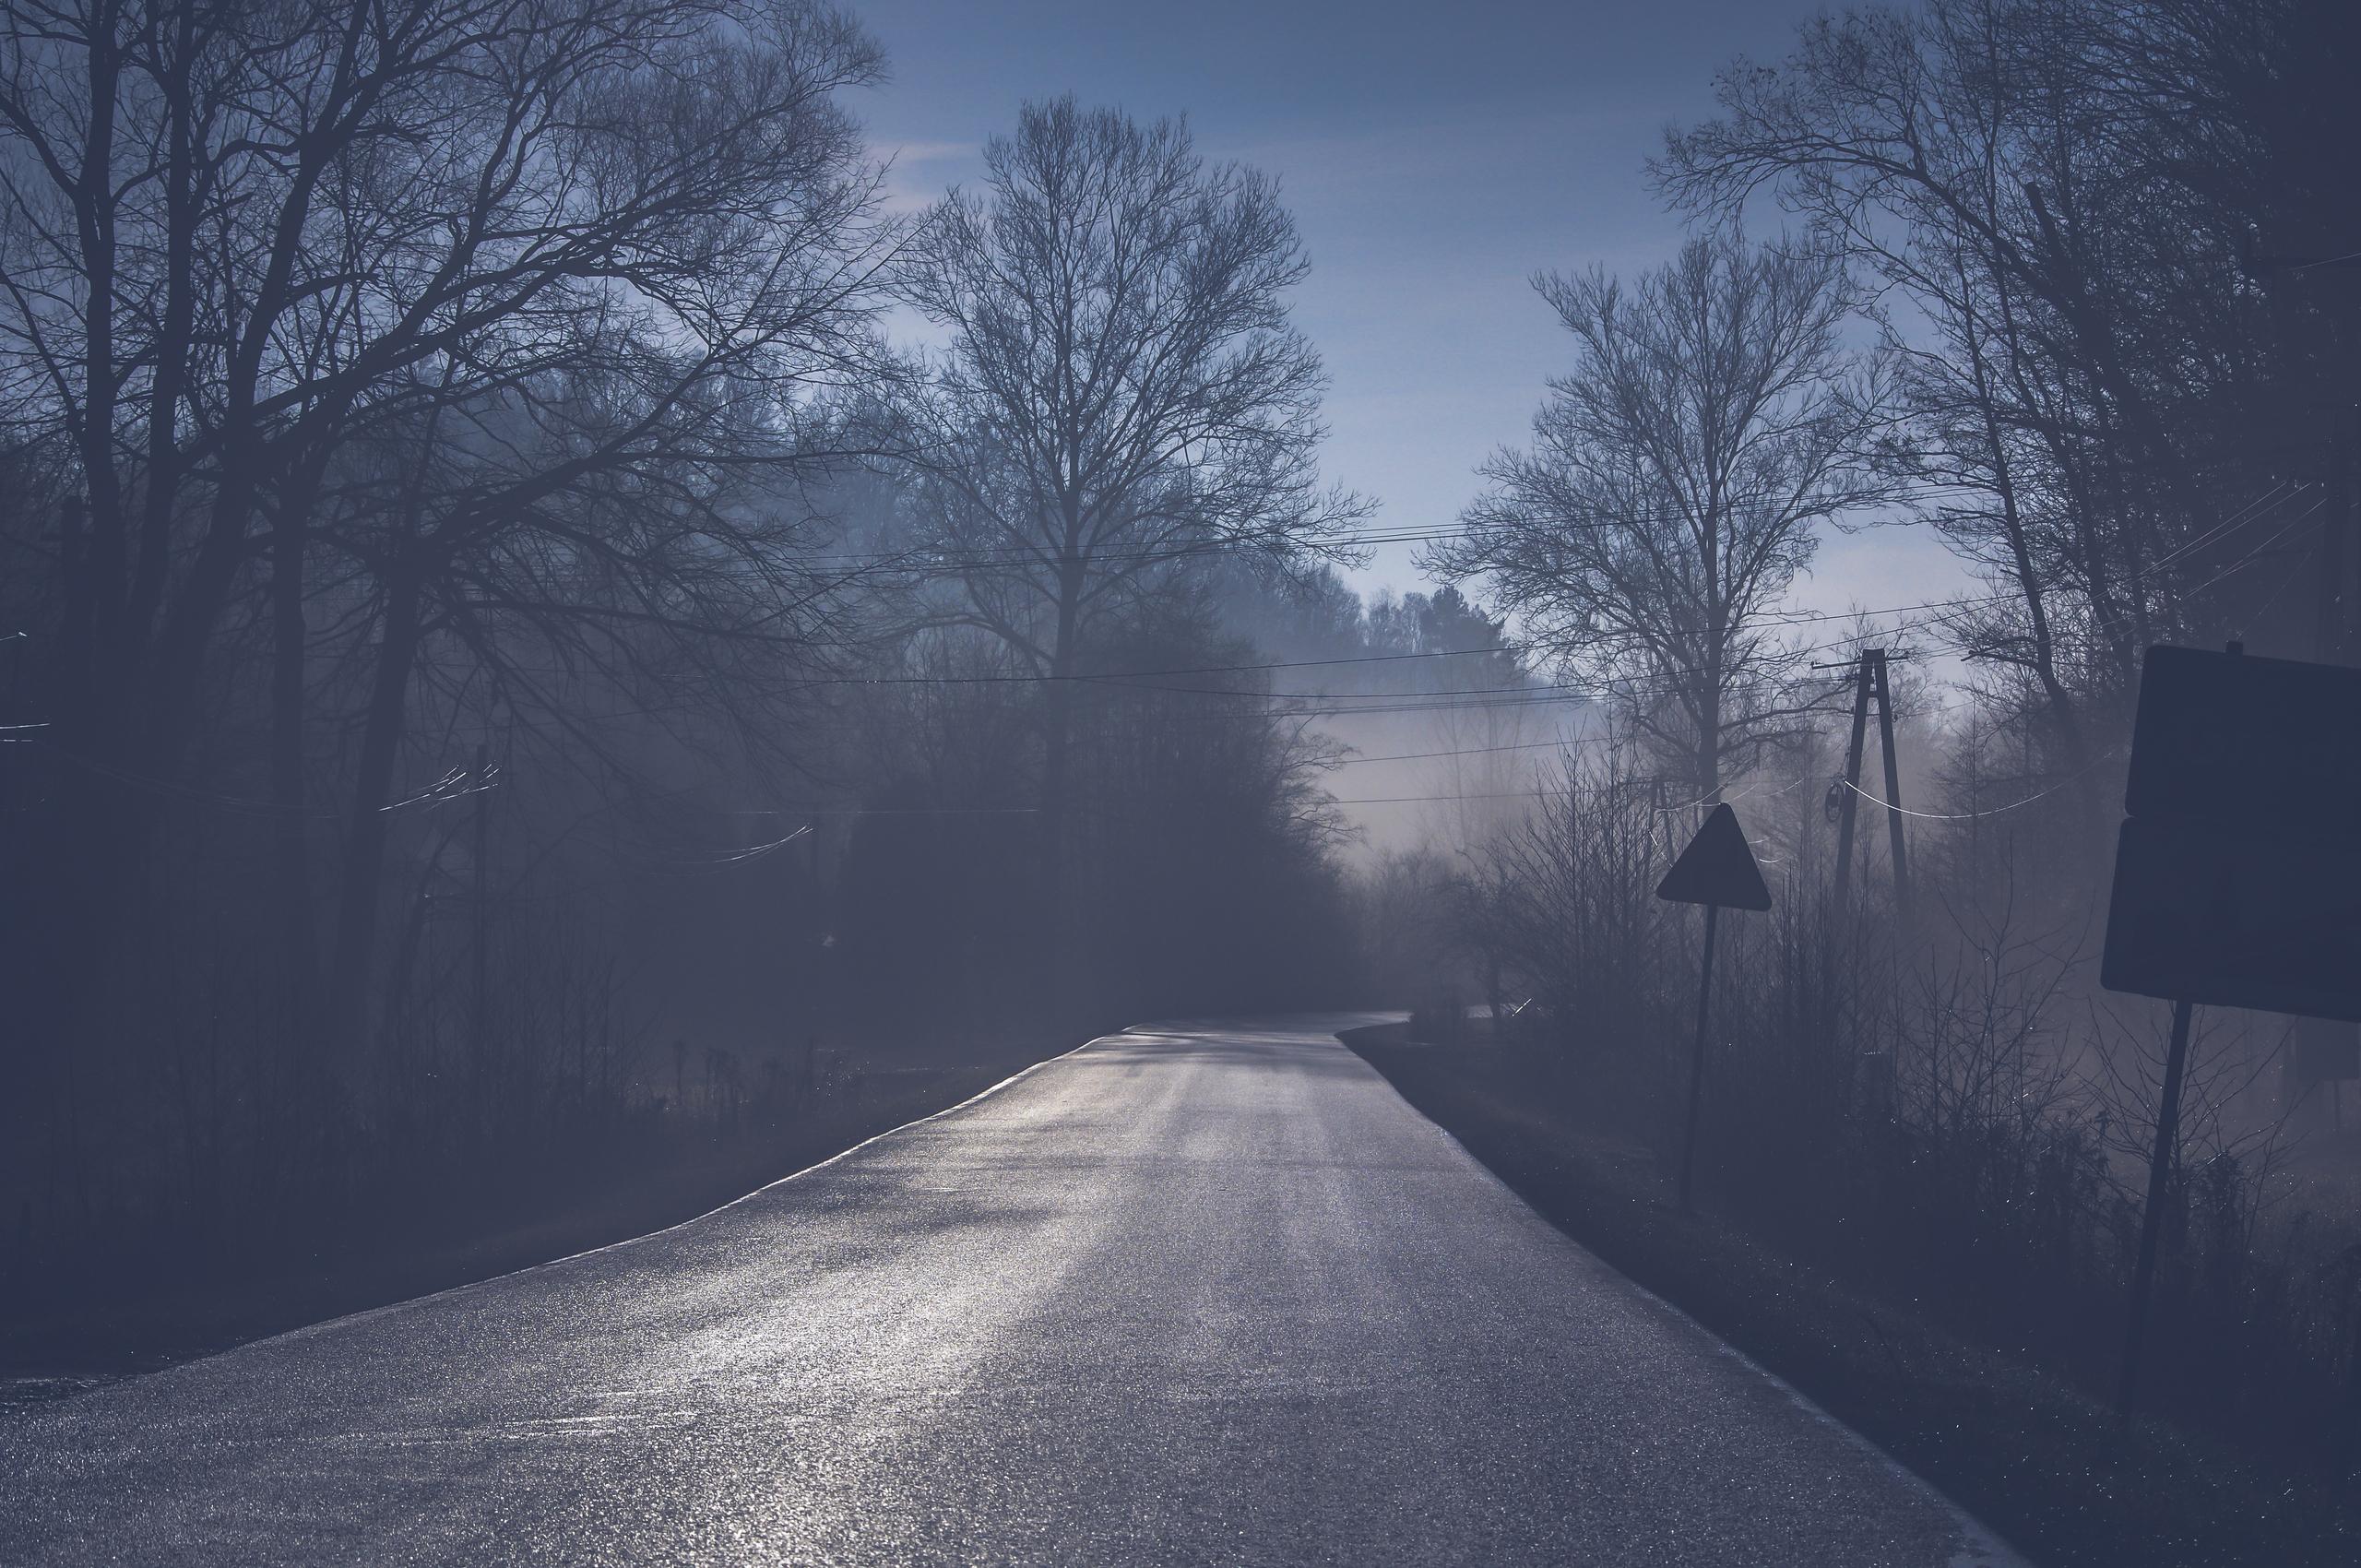 road-tree-mist-5k-f5.jpg